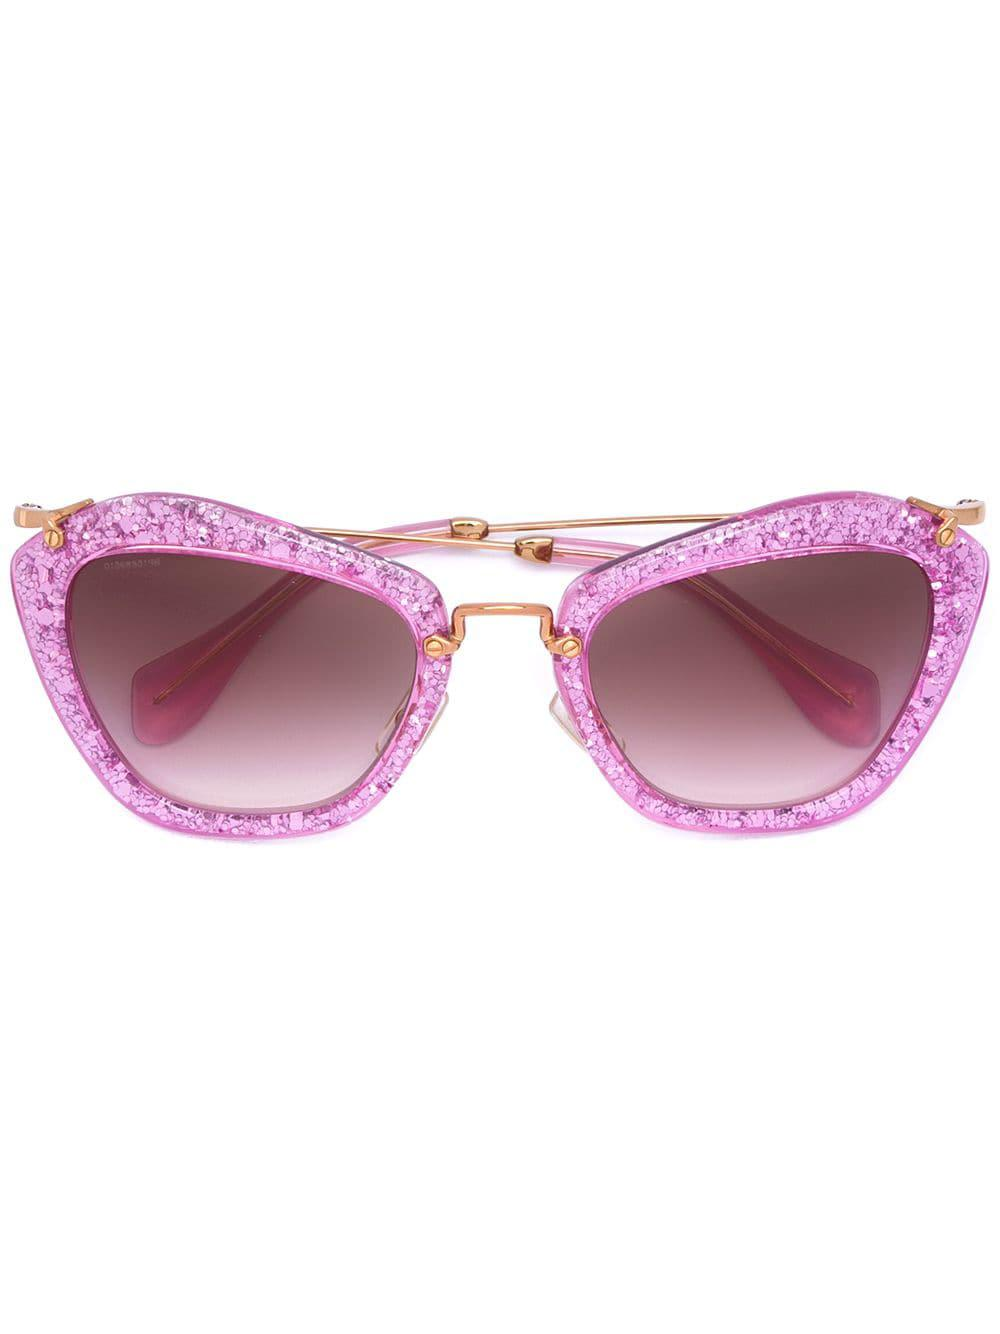 Miu Miu Noir Sunglasses in Pink & Purple (Pink)